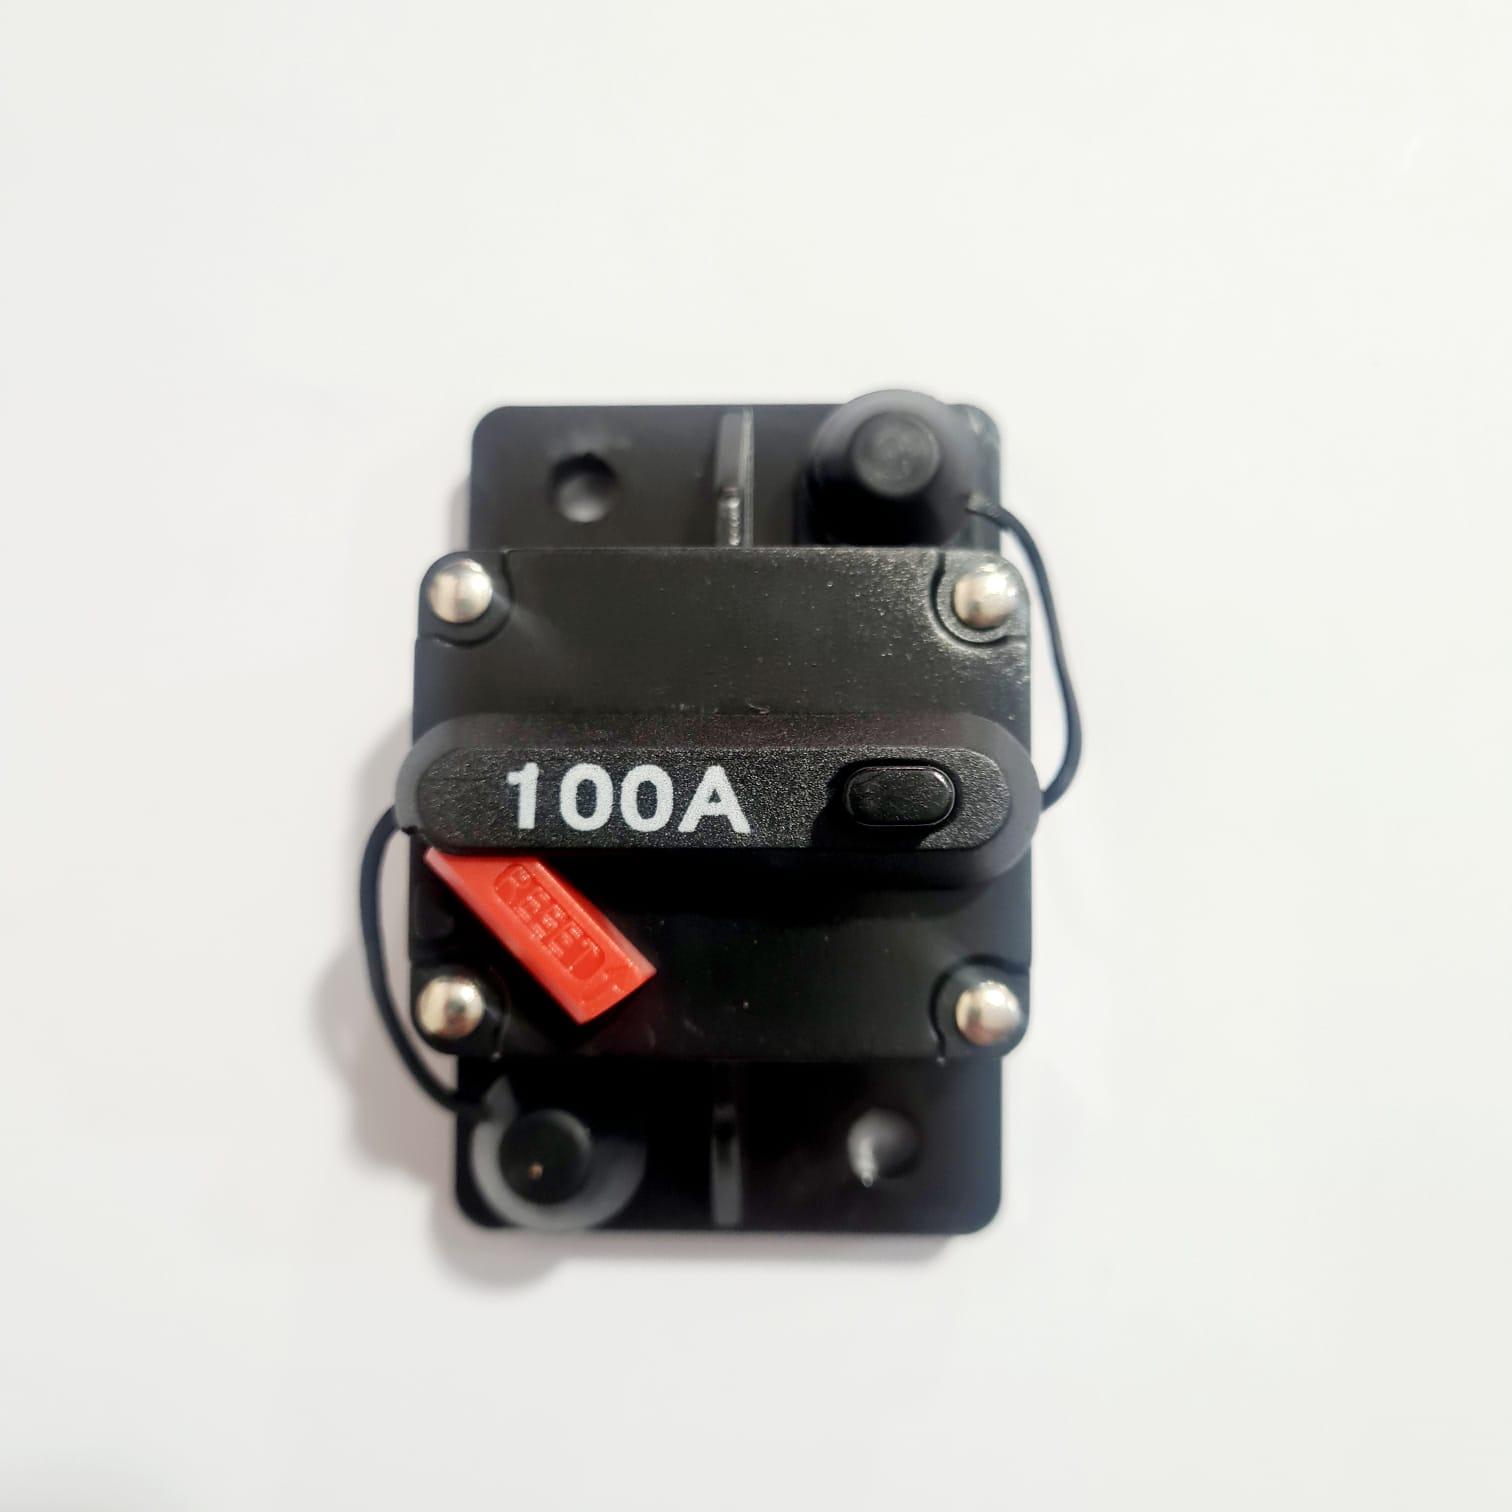 Disjuntor Automotivo 100A 28.074.100